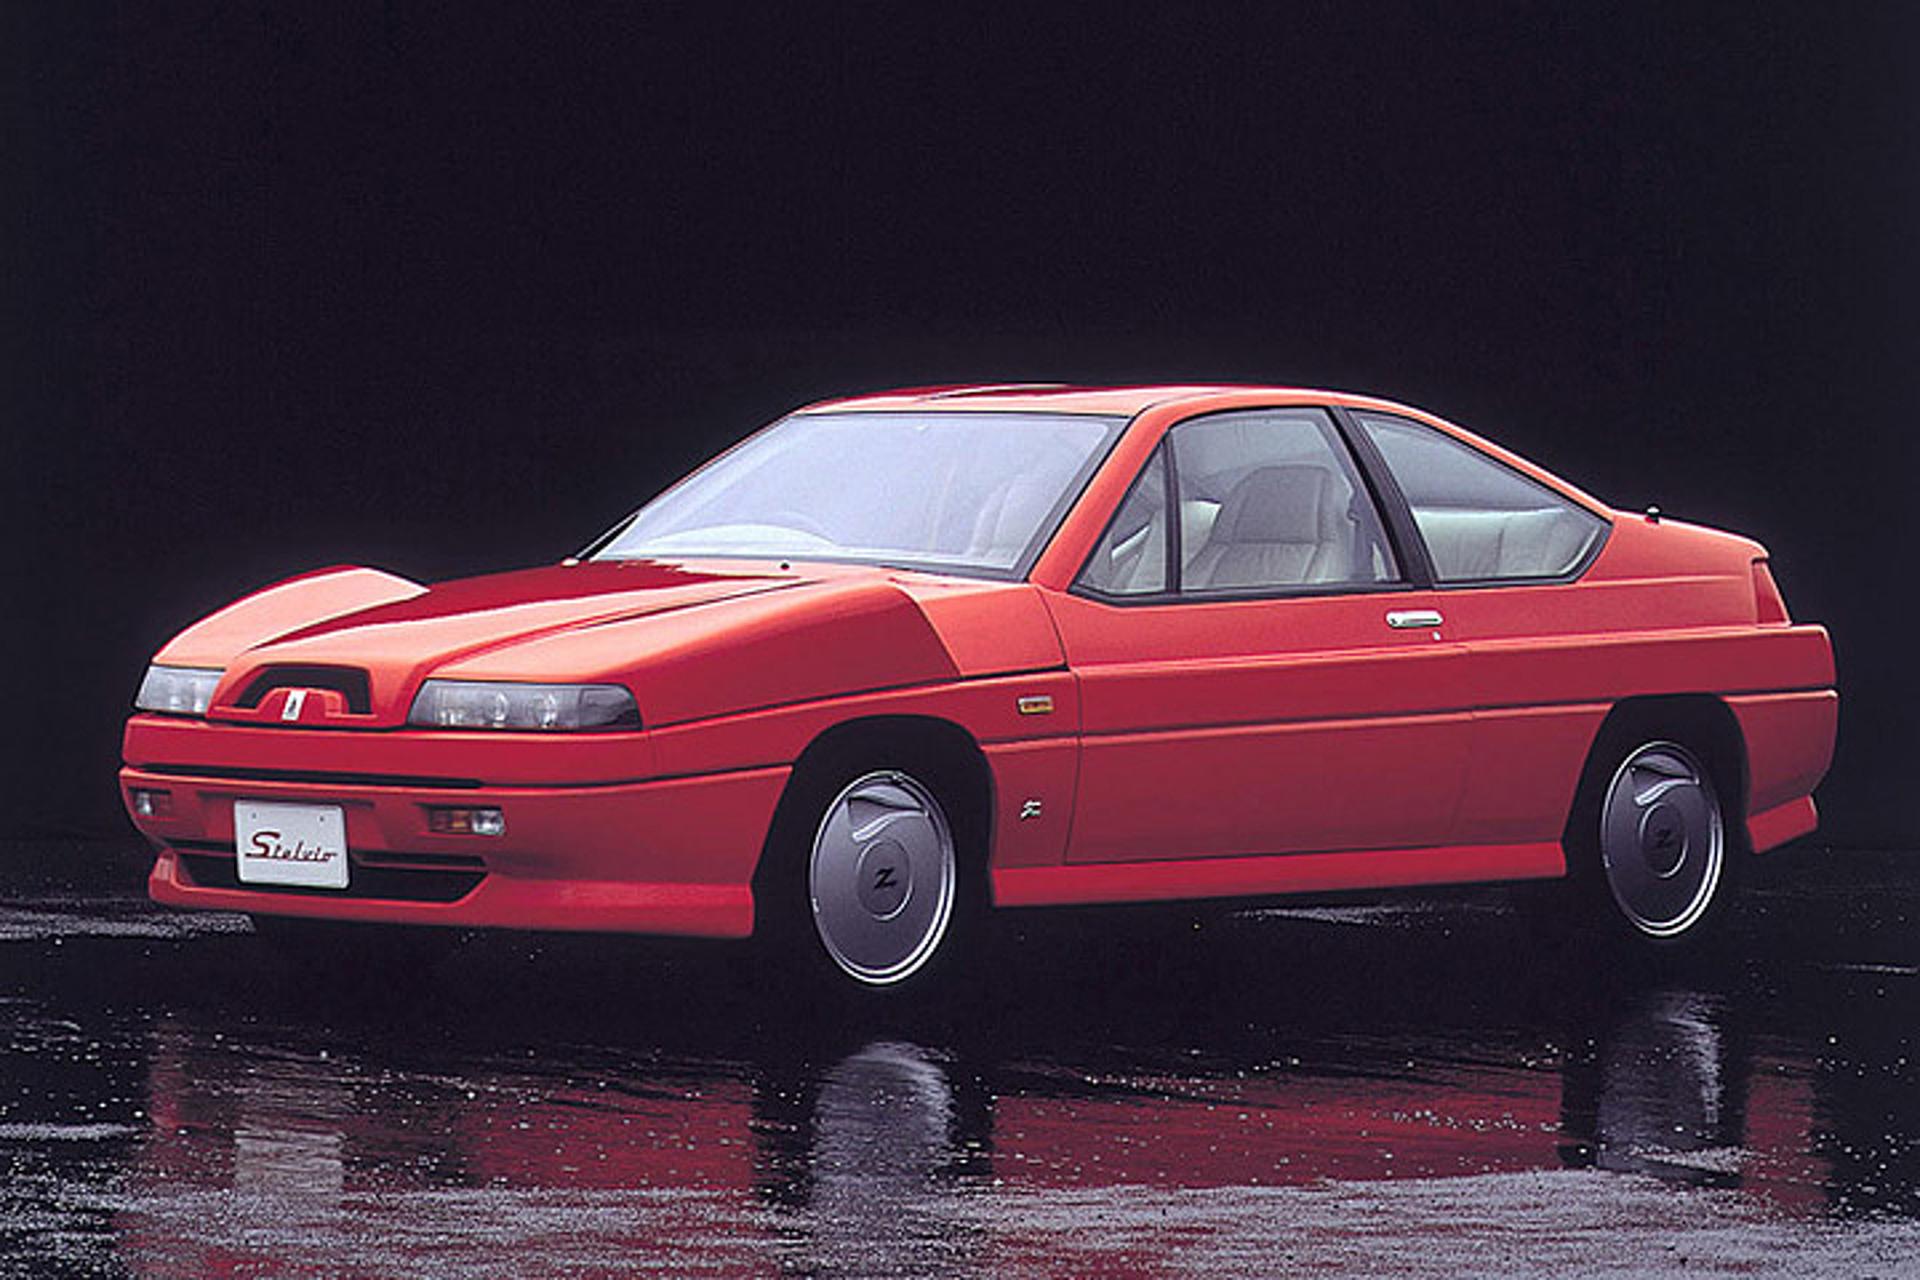 1991 Nissan Autech Zagato Stelvio